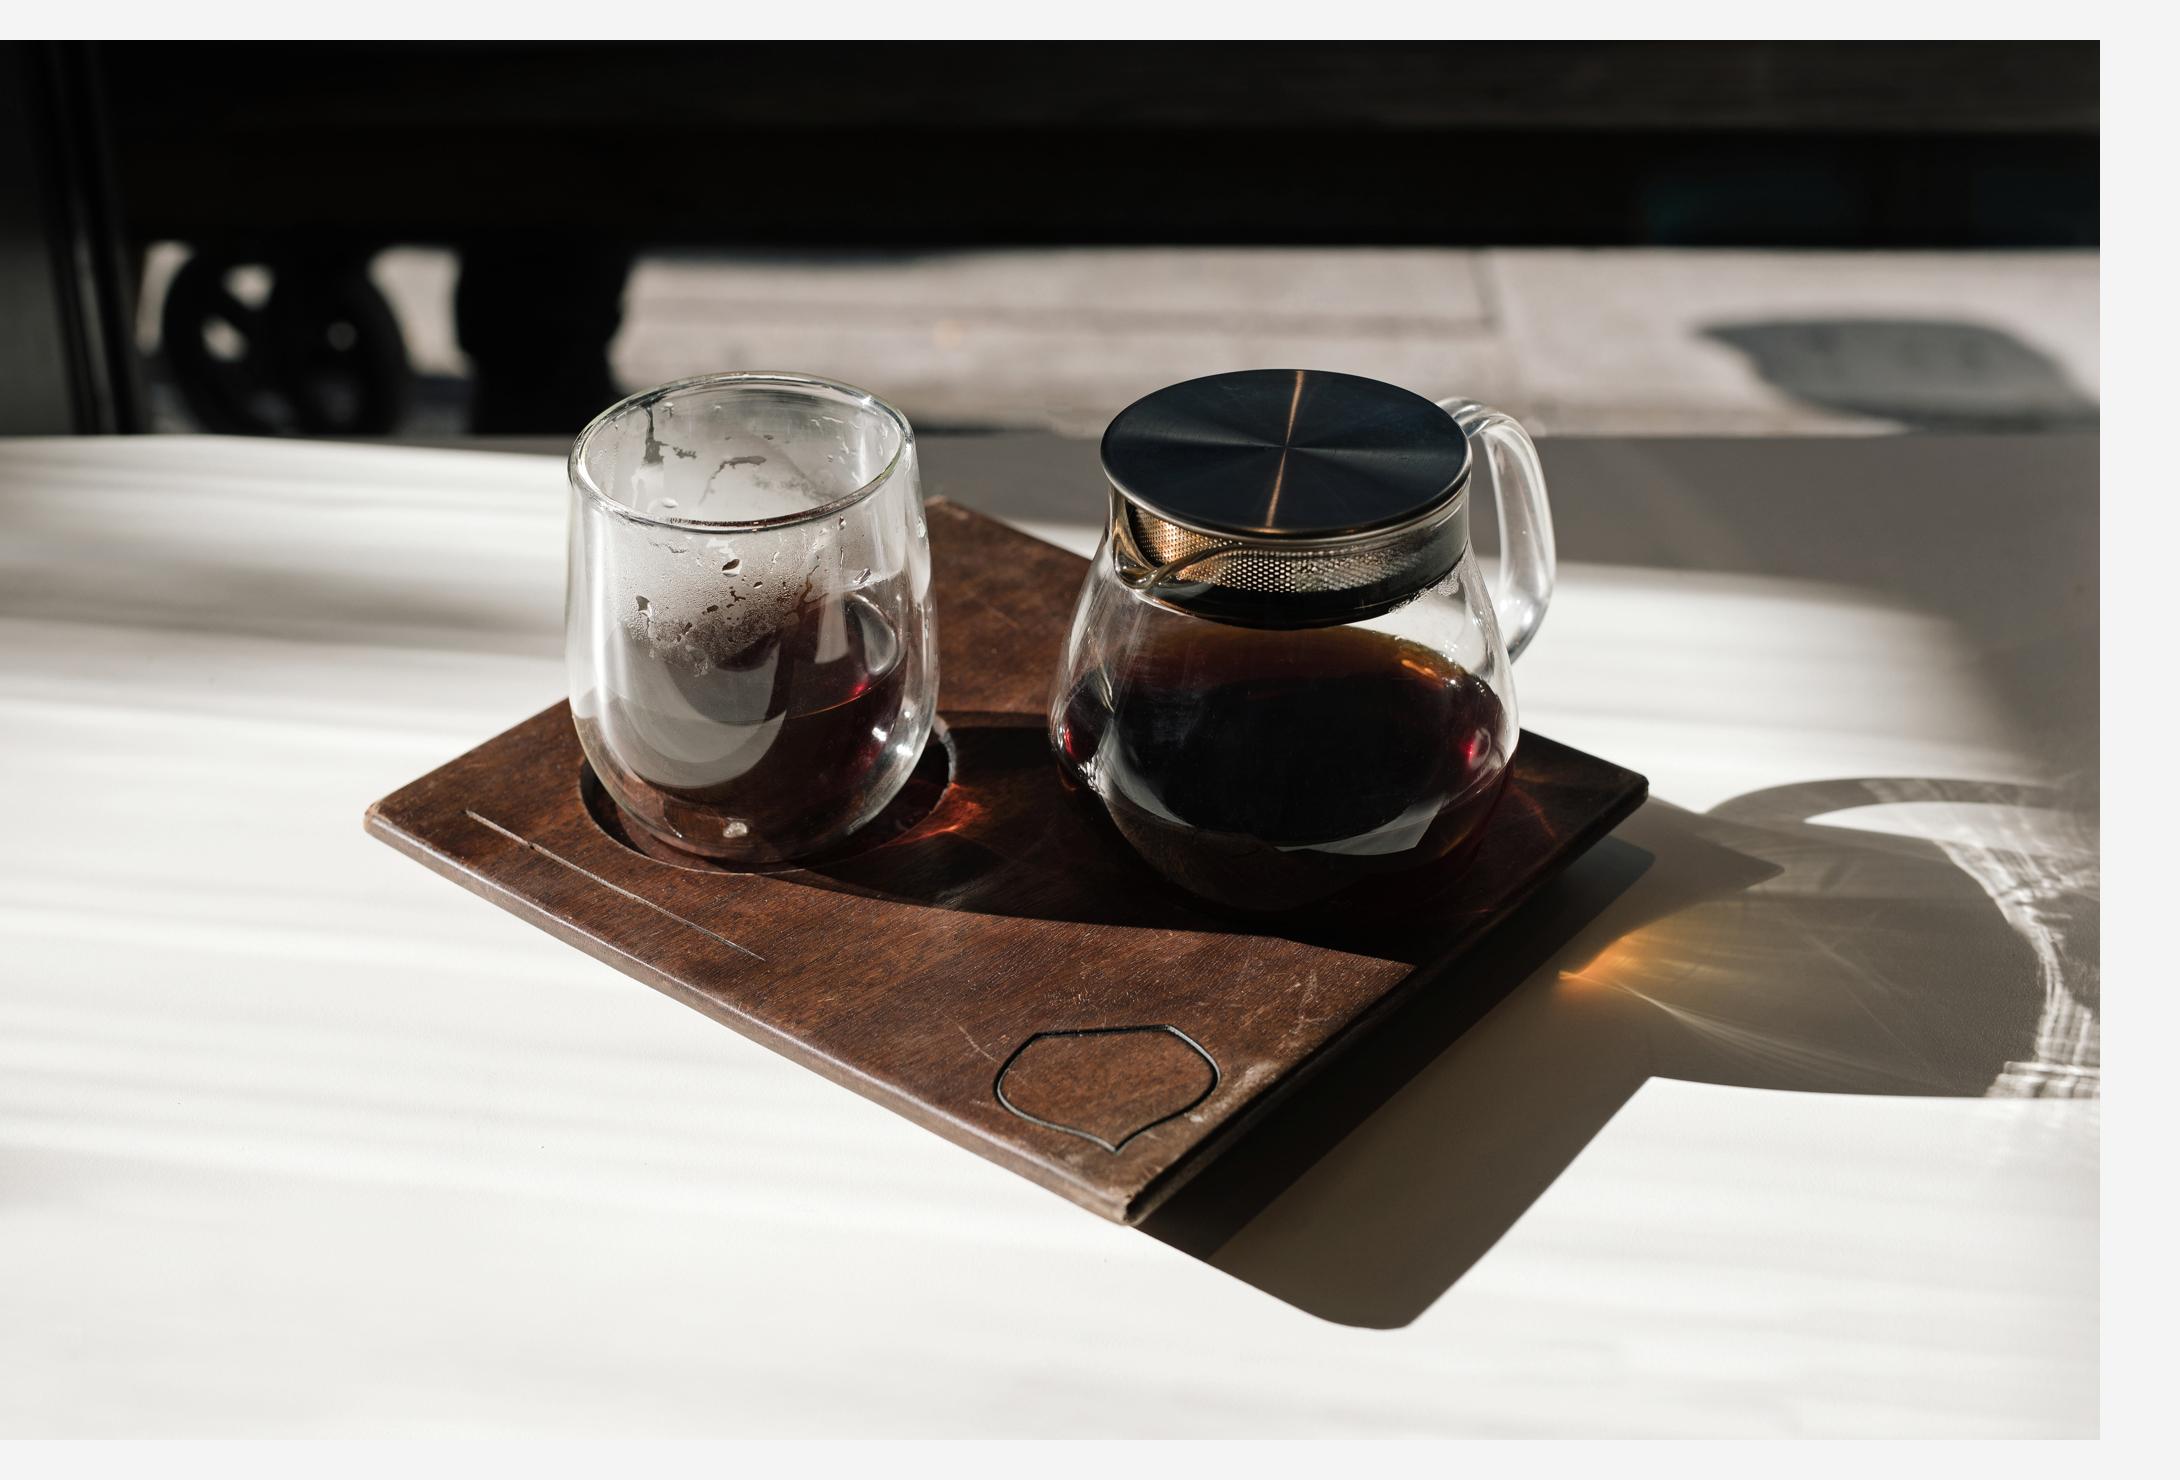 onthenorway brighton coffee england